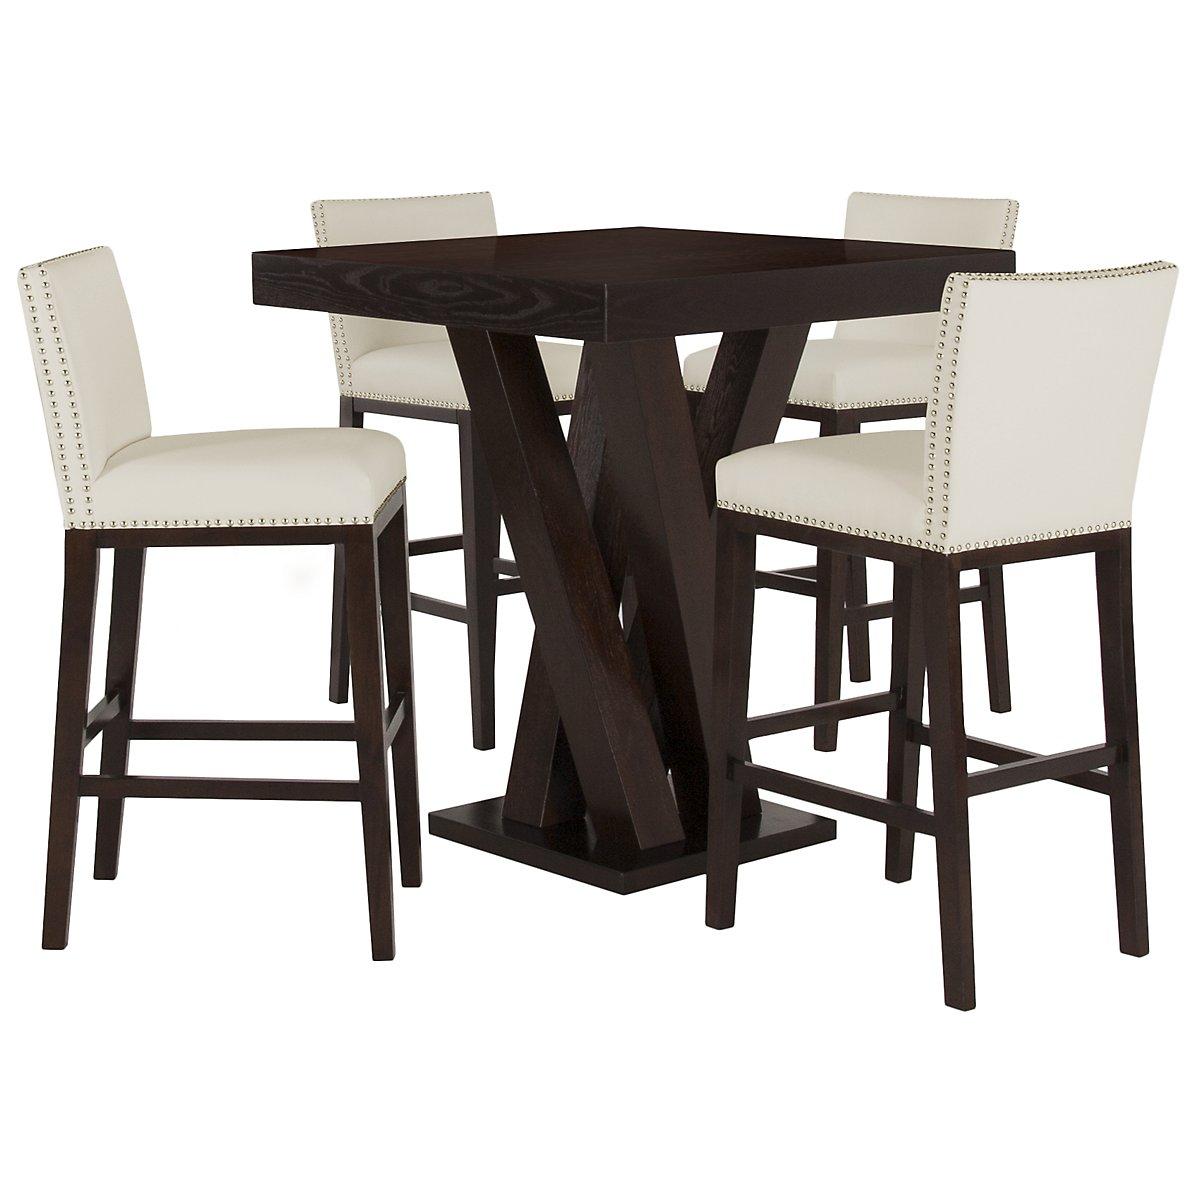 Tiffany White Pub Table & 2 Bonded Barstools